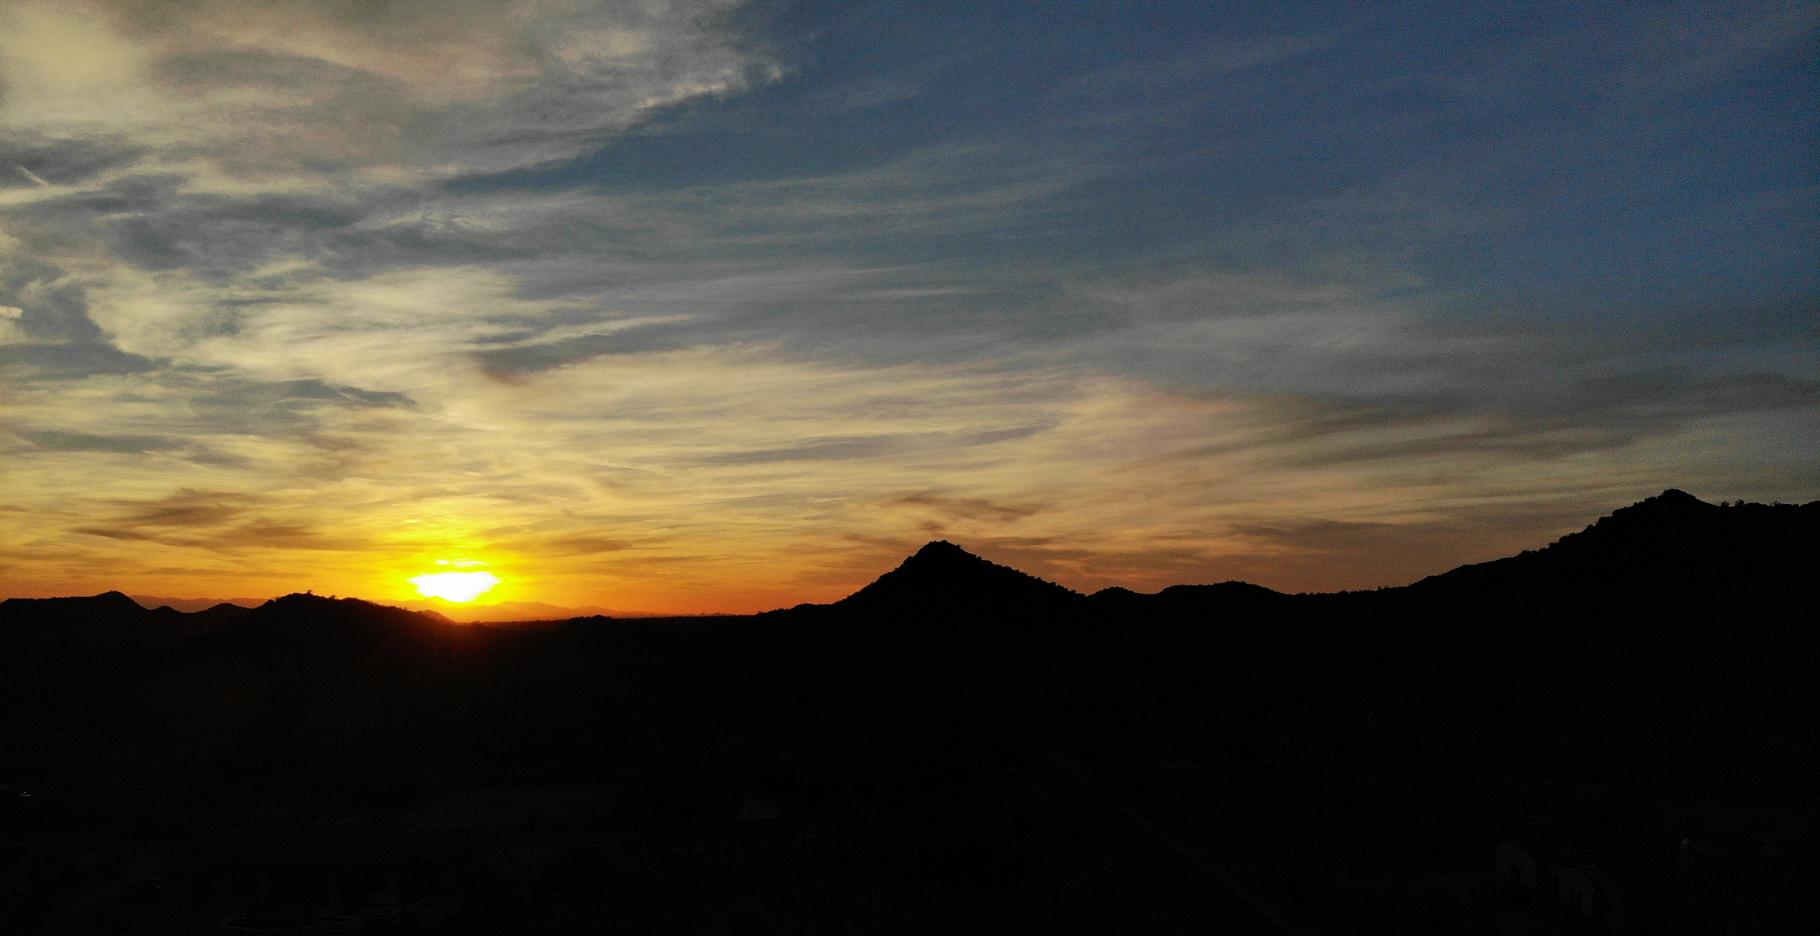 DJI Mavic Air shot of AZ desert sunset's waning moments